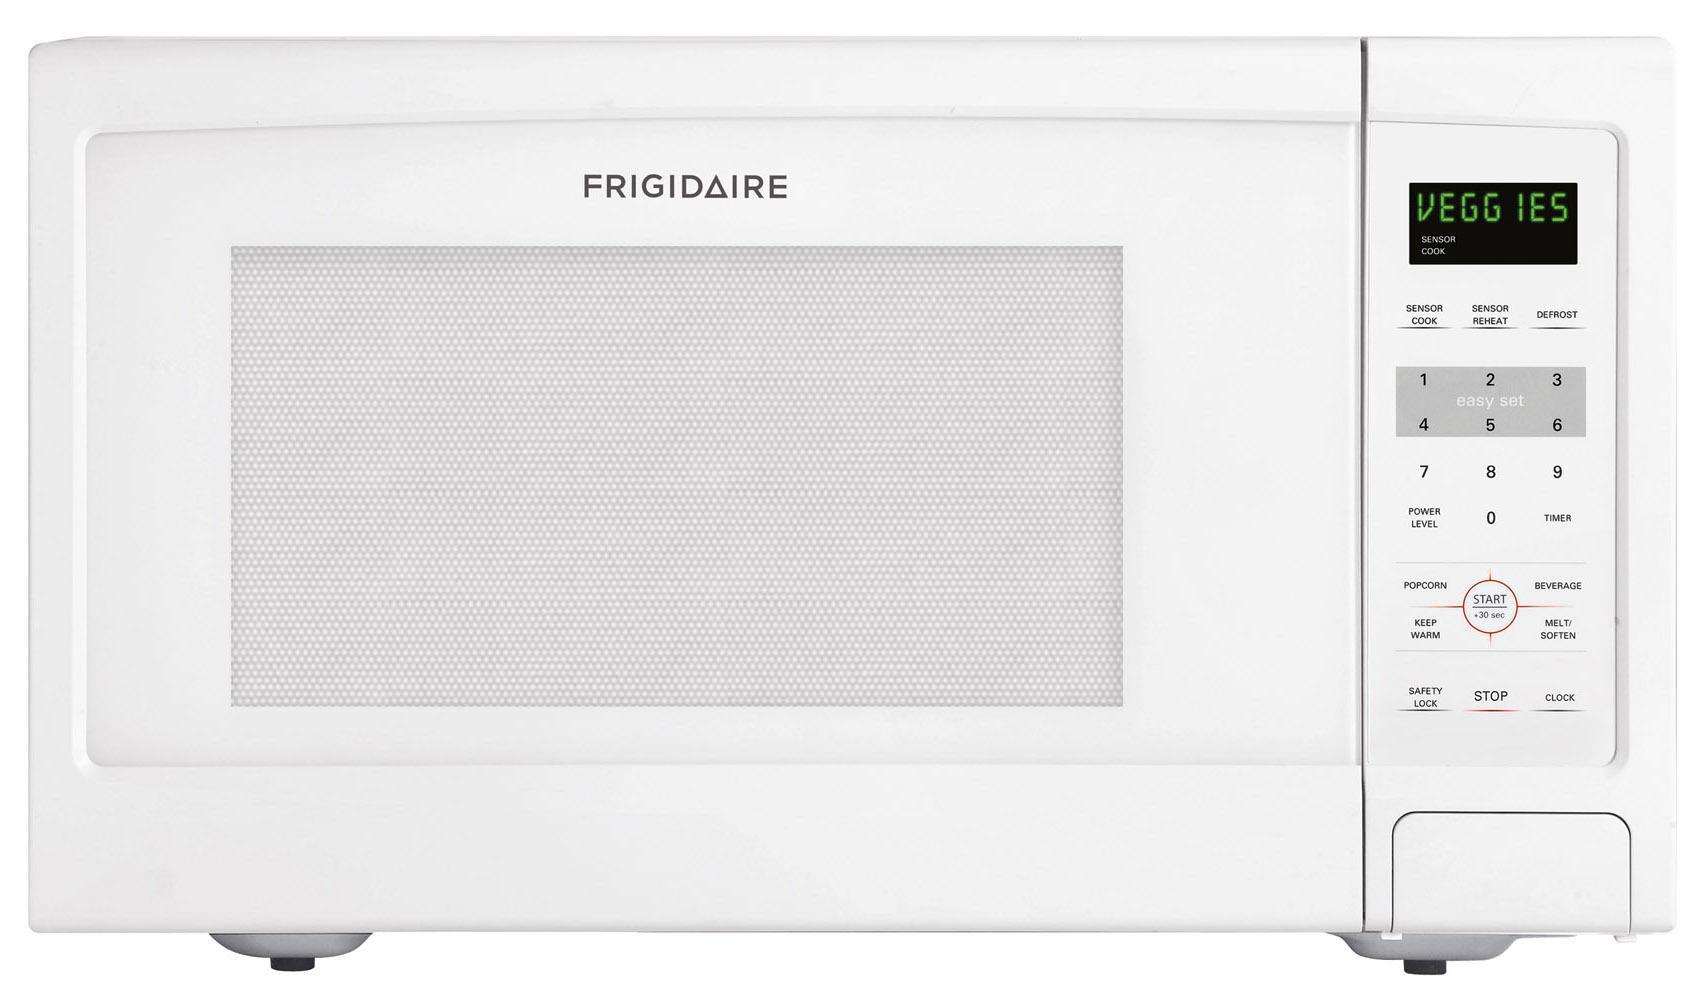 Frigidaire Microwaves 1.6 Cu. Ft. Countertop Microwave - Item Number: FFCE1638LW